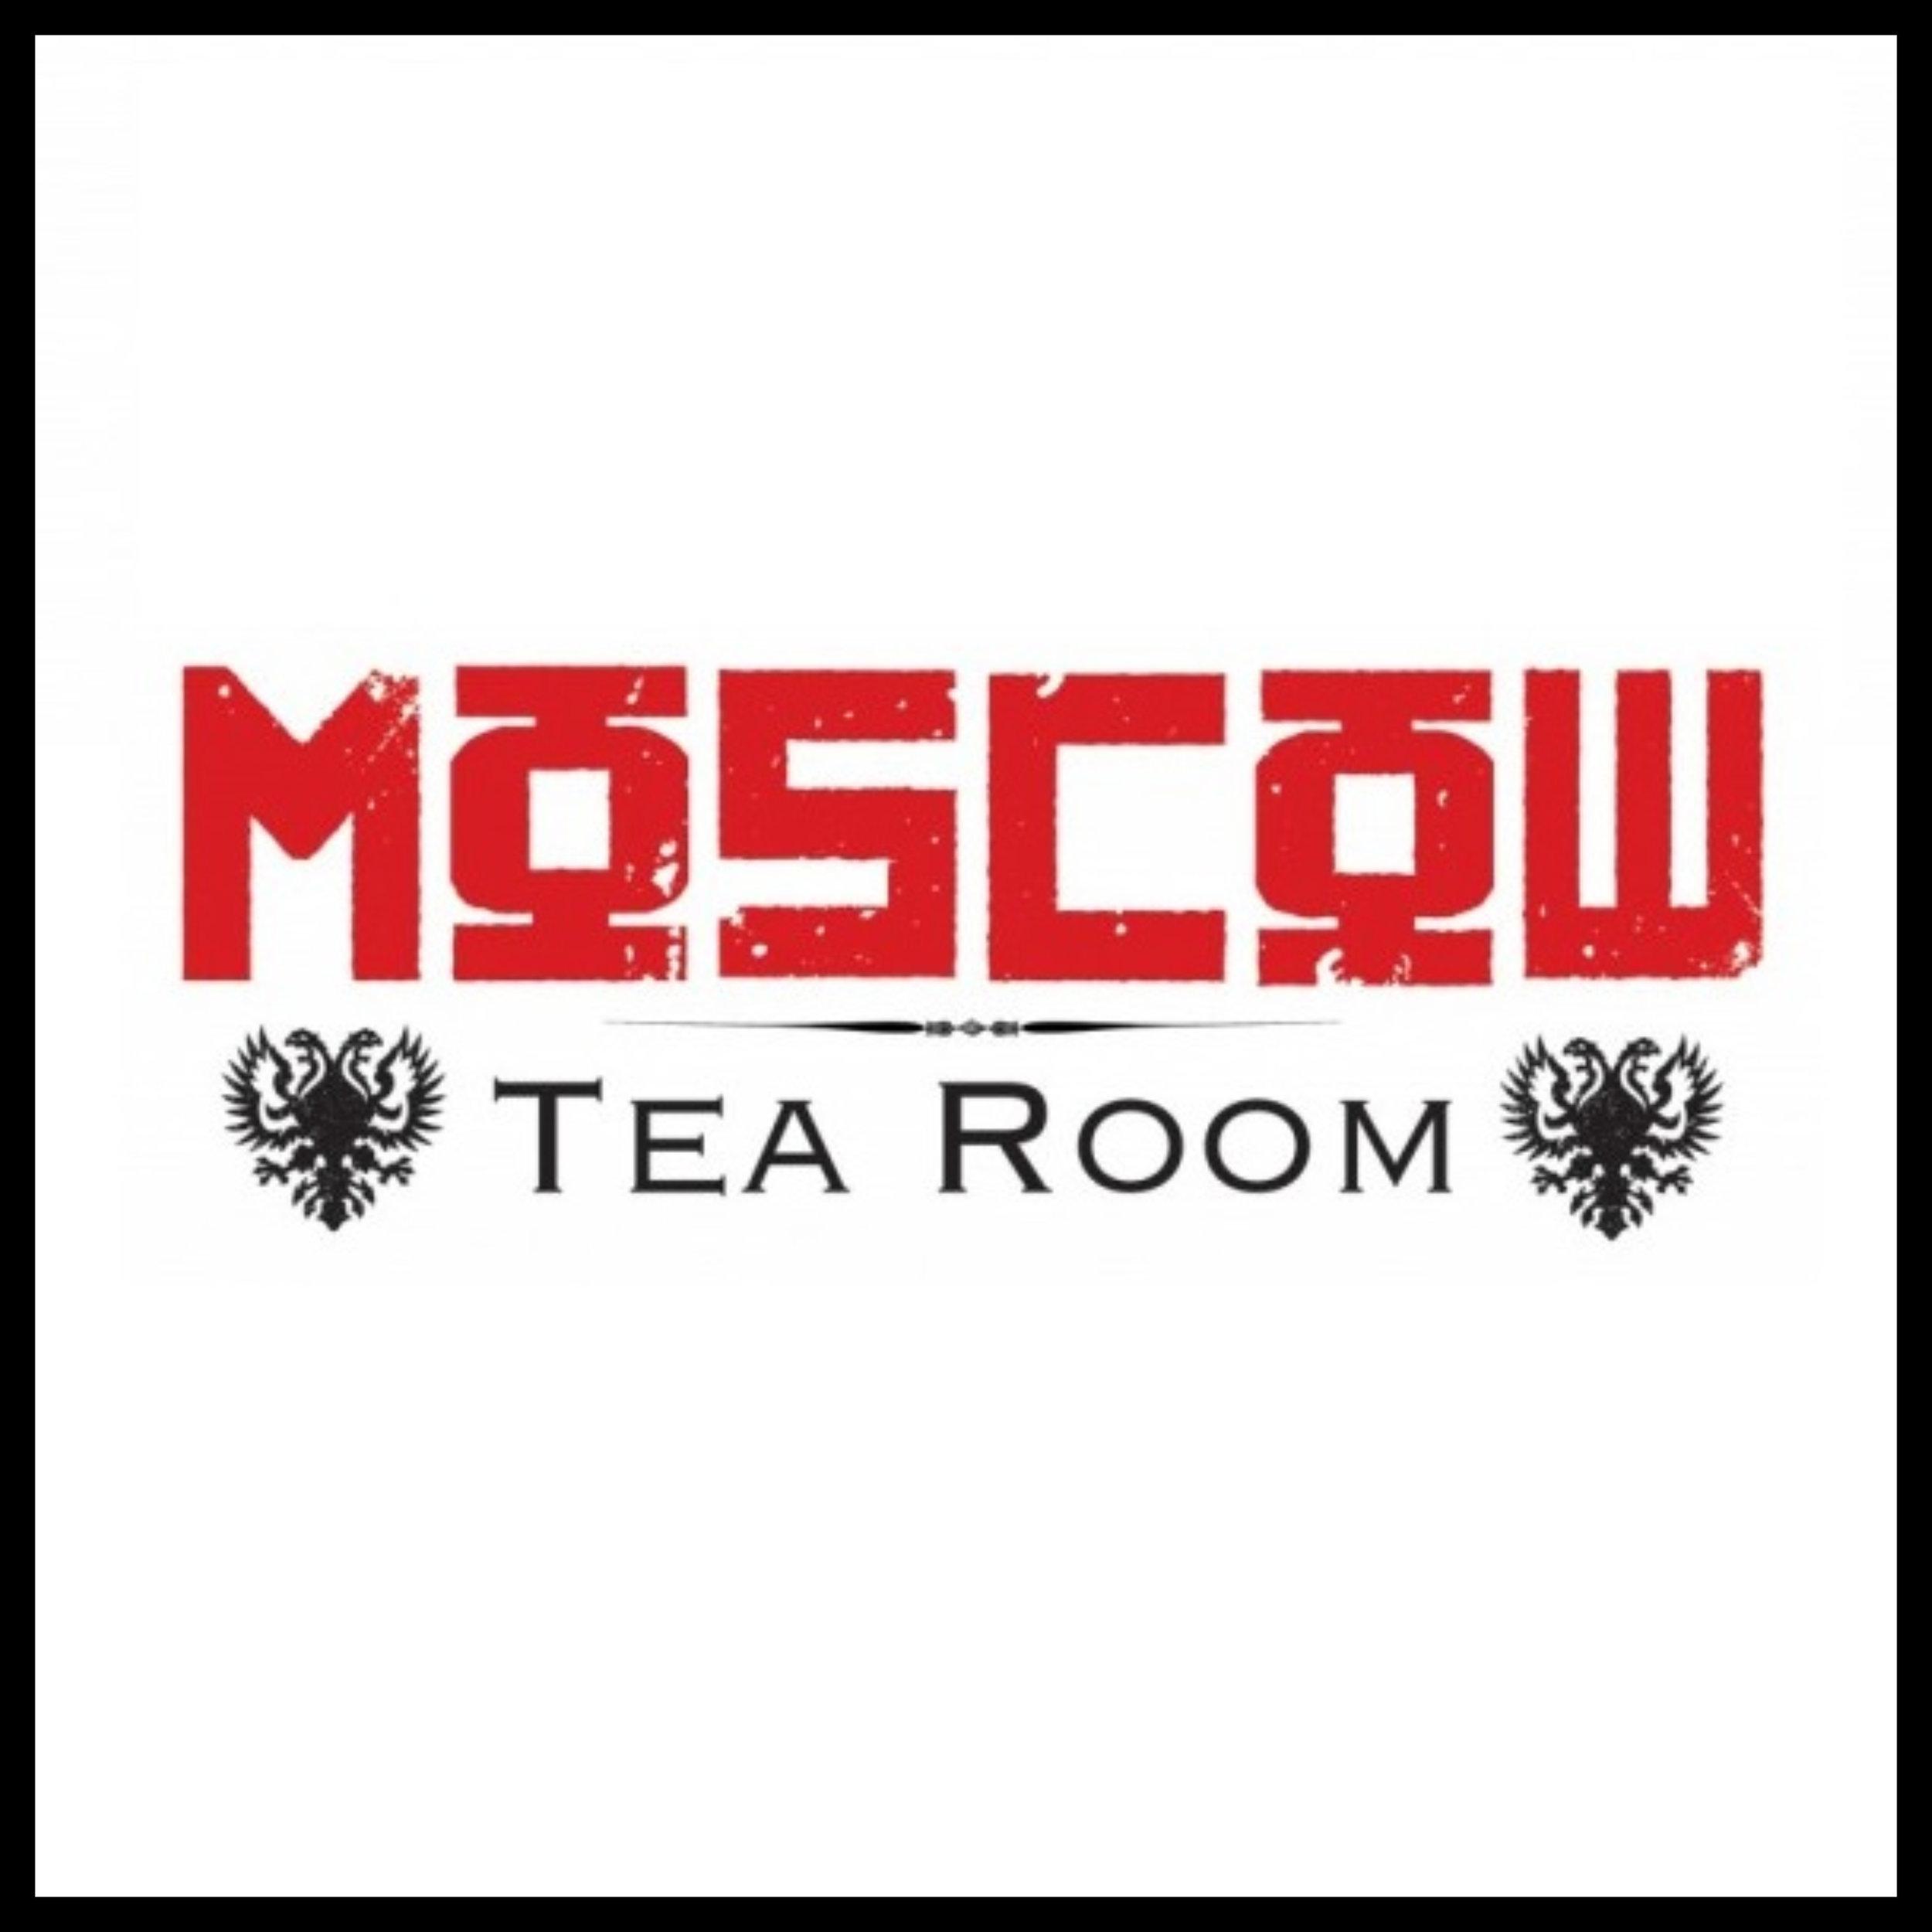 MoscowTeaRoomSQ.jpg